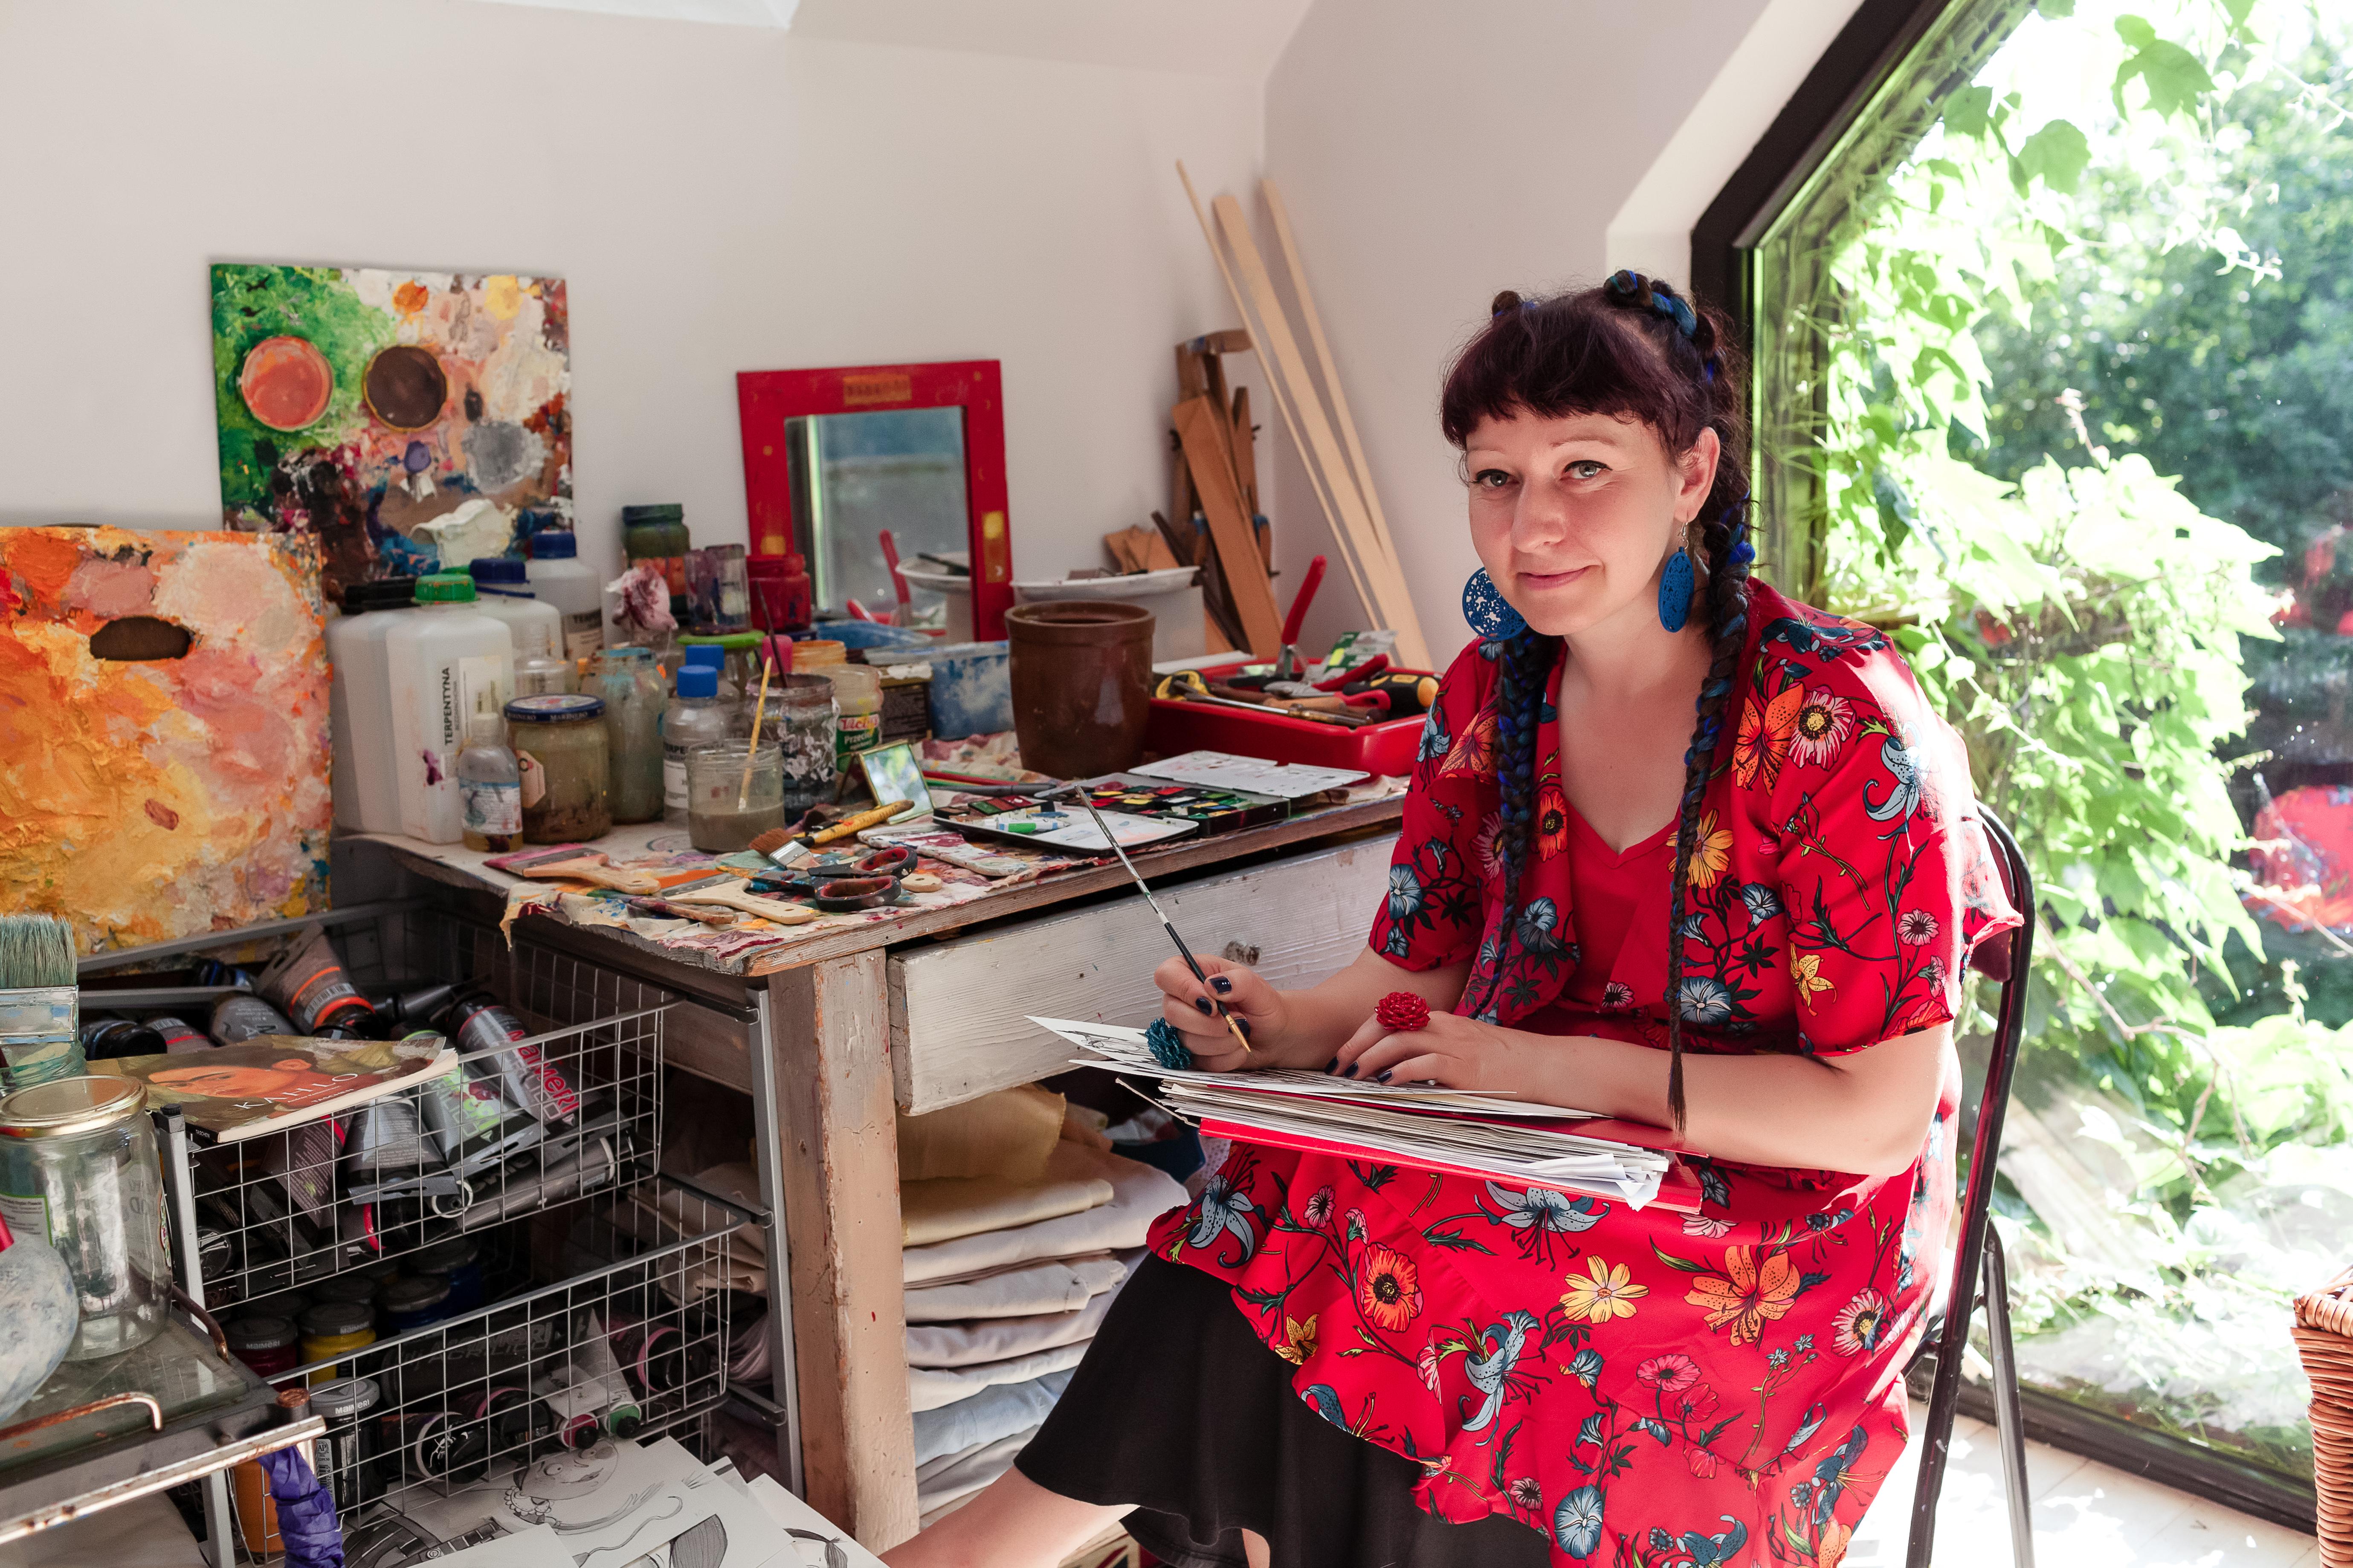 Anna Kaszuba-Dębska in her workshop in Cracow.